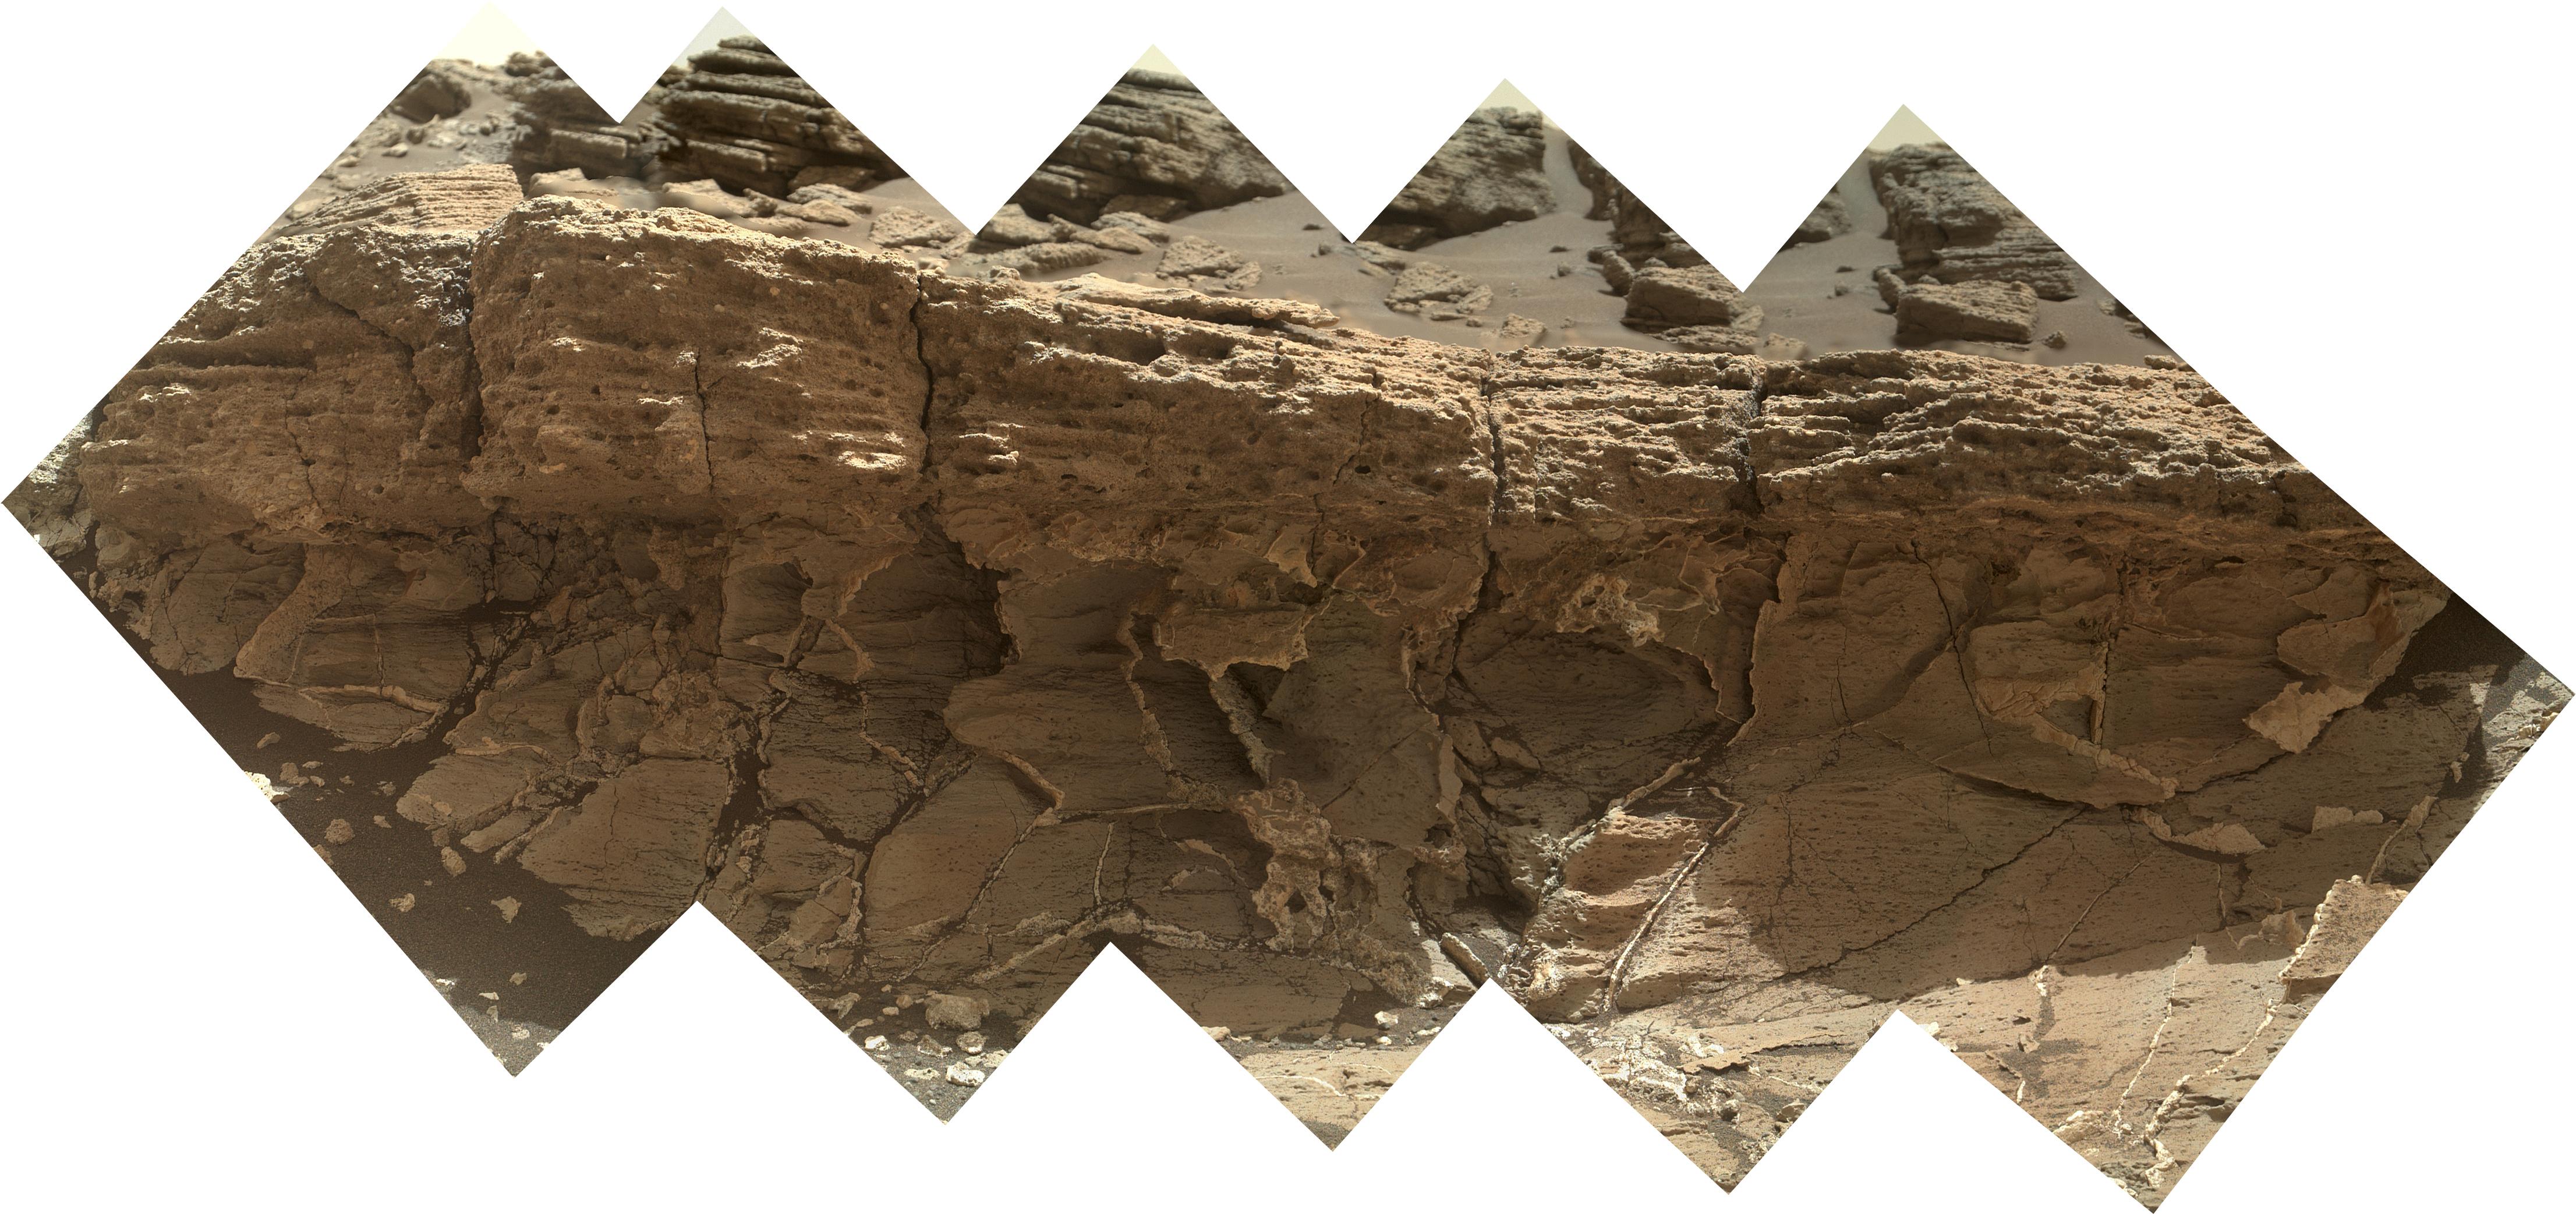 NASA's Curiosity Rover Inspects Unusual Bedrock | Mars News